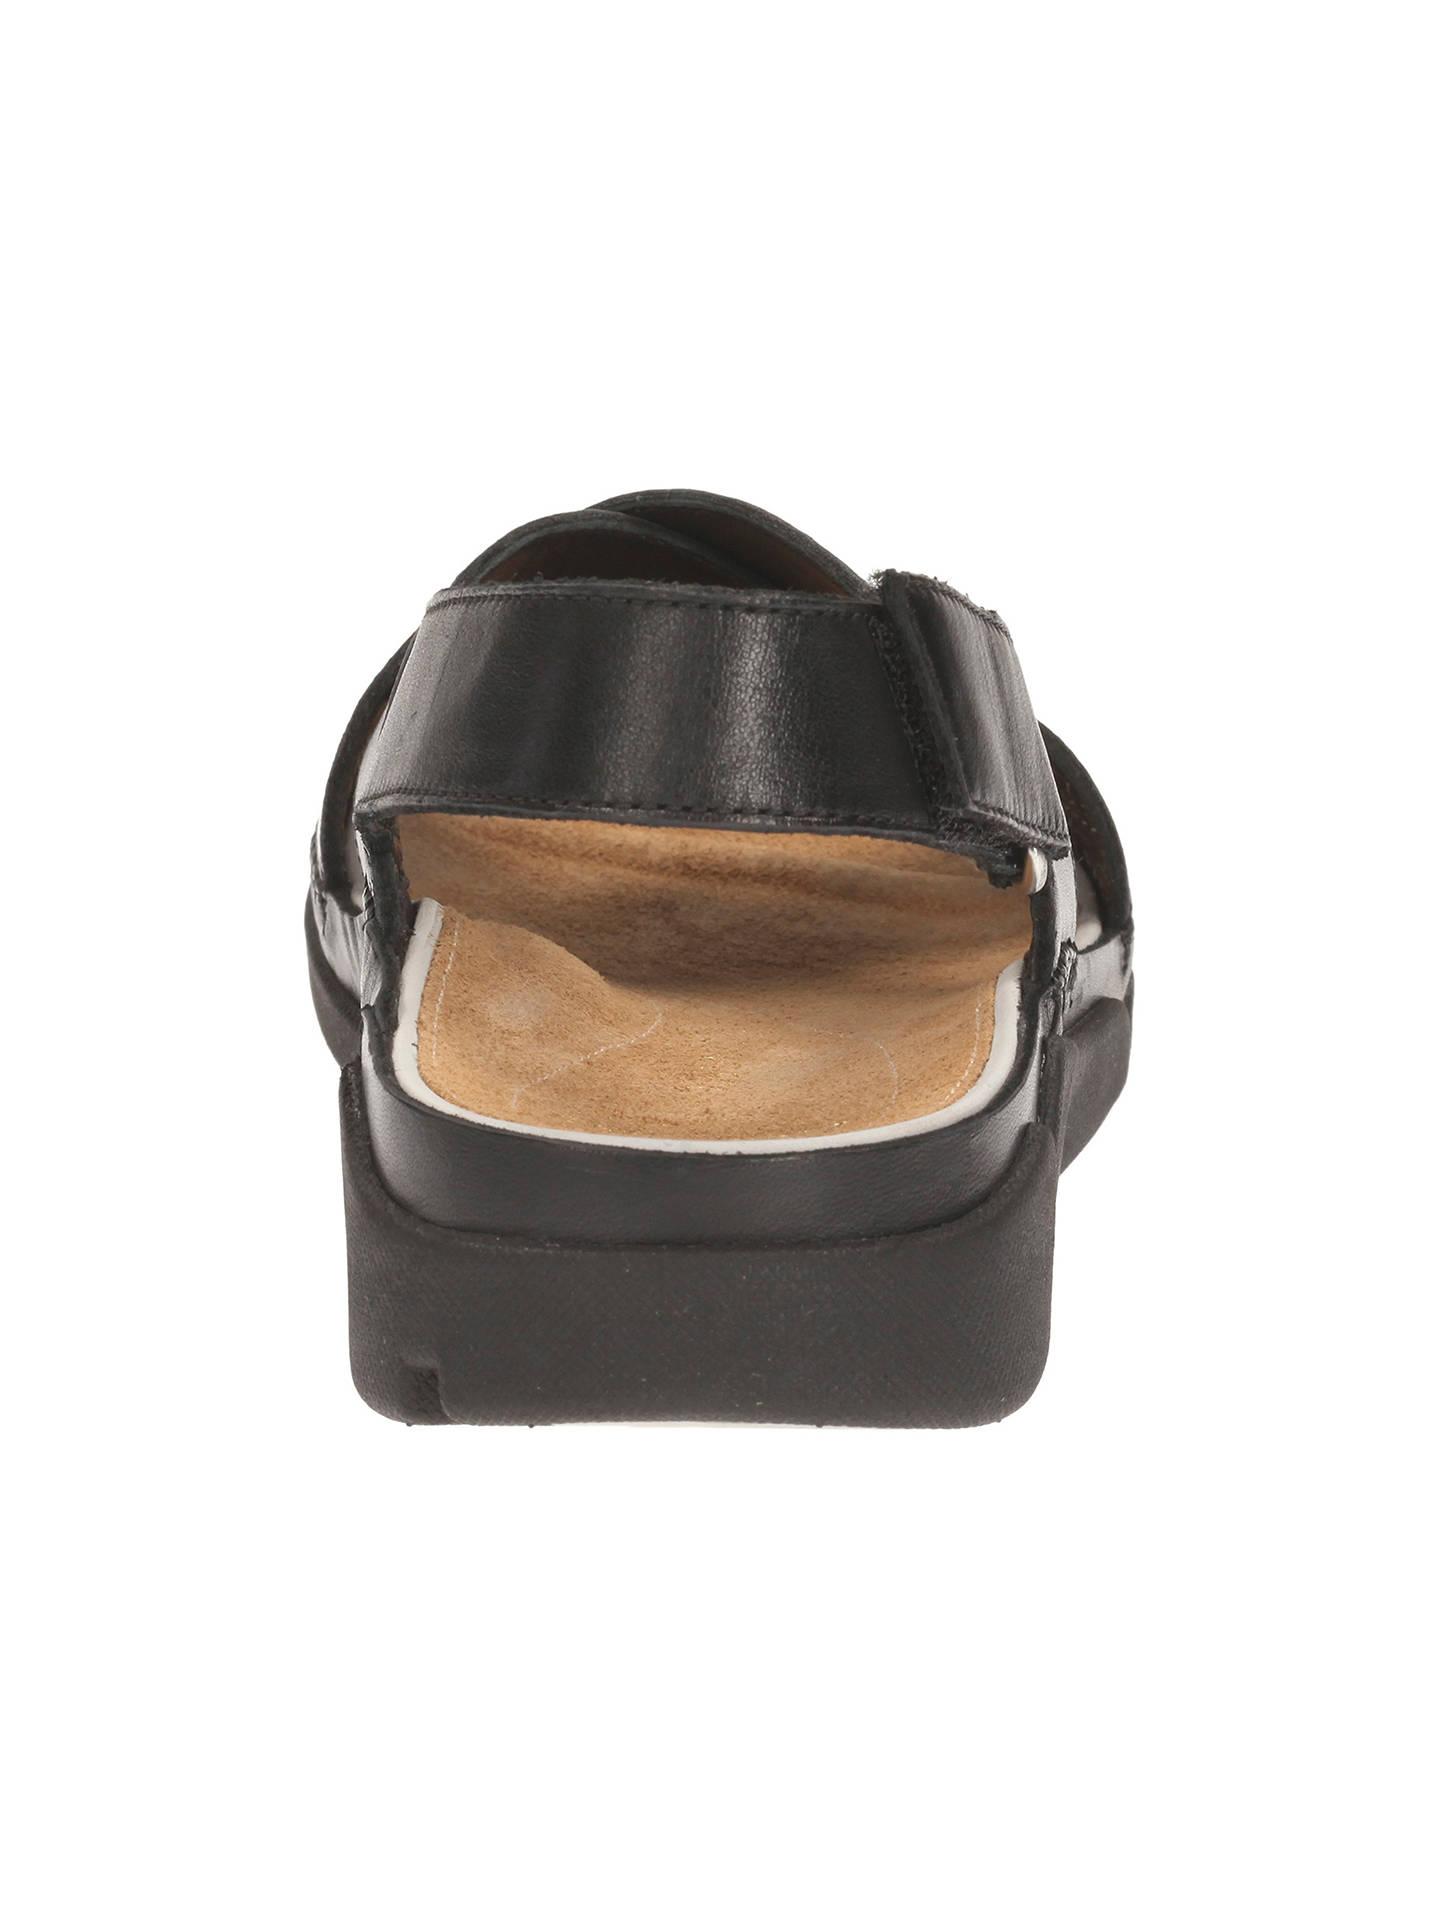 73b120a397e5 Clarks Tri Alexia Leather Sandals at John Lewis   Partners